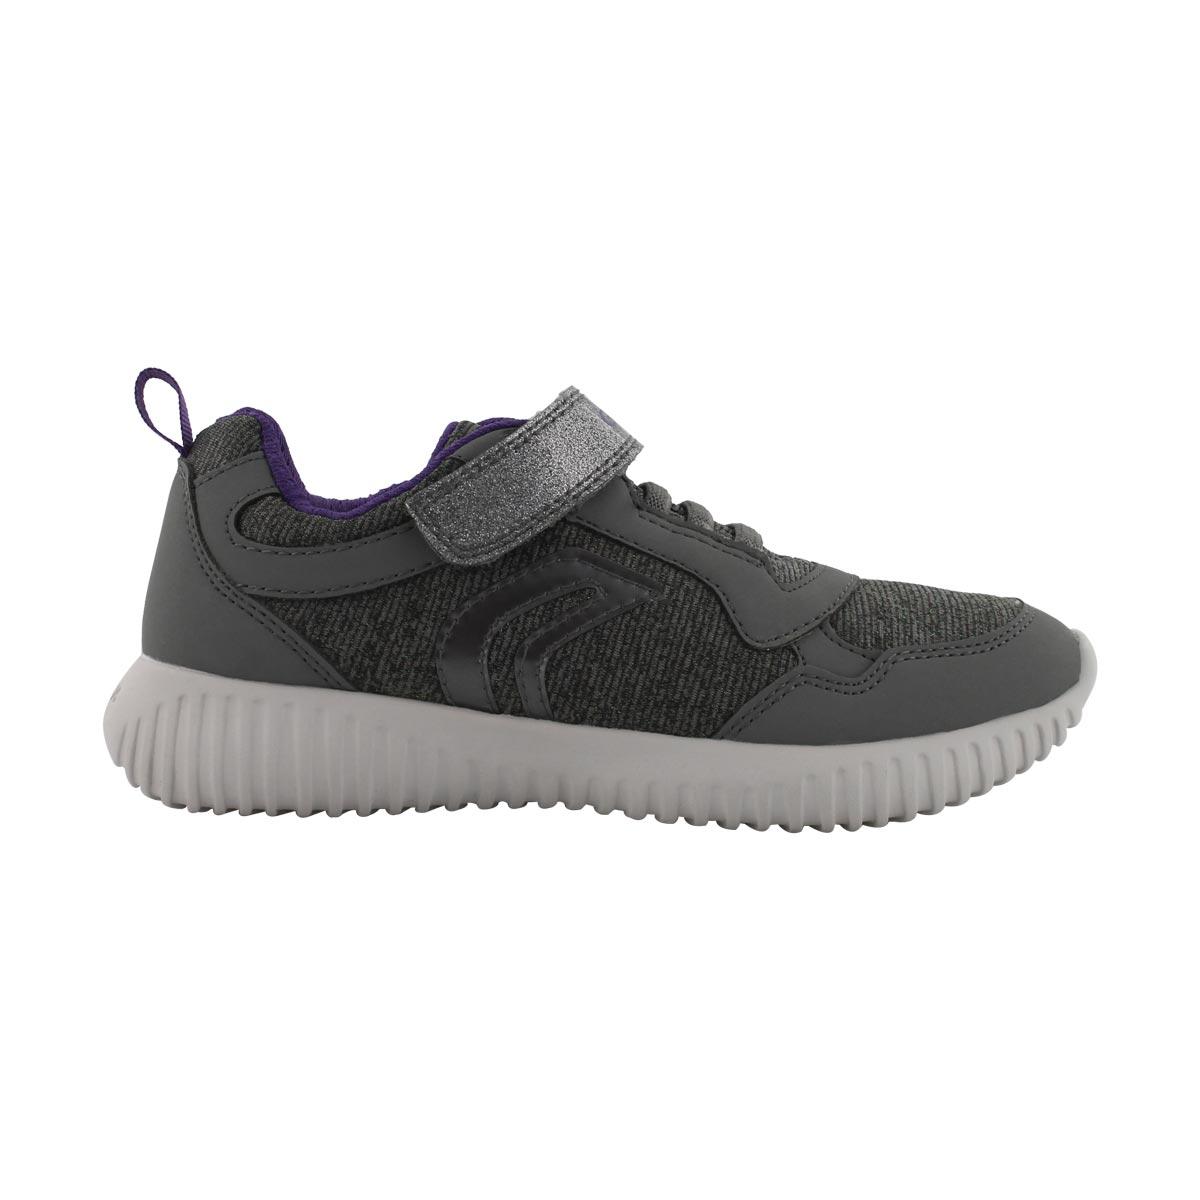 Grls Waviness B gry/vio strap sneaker